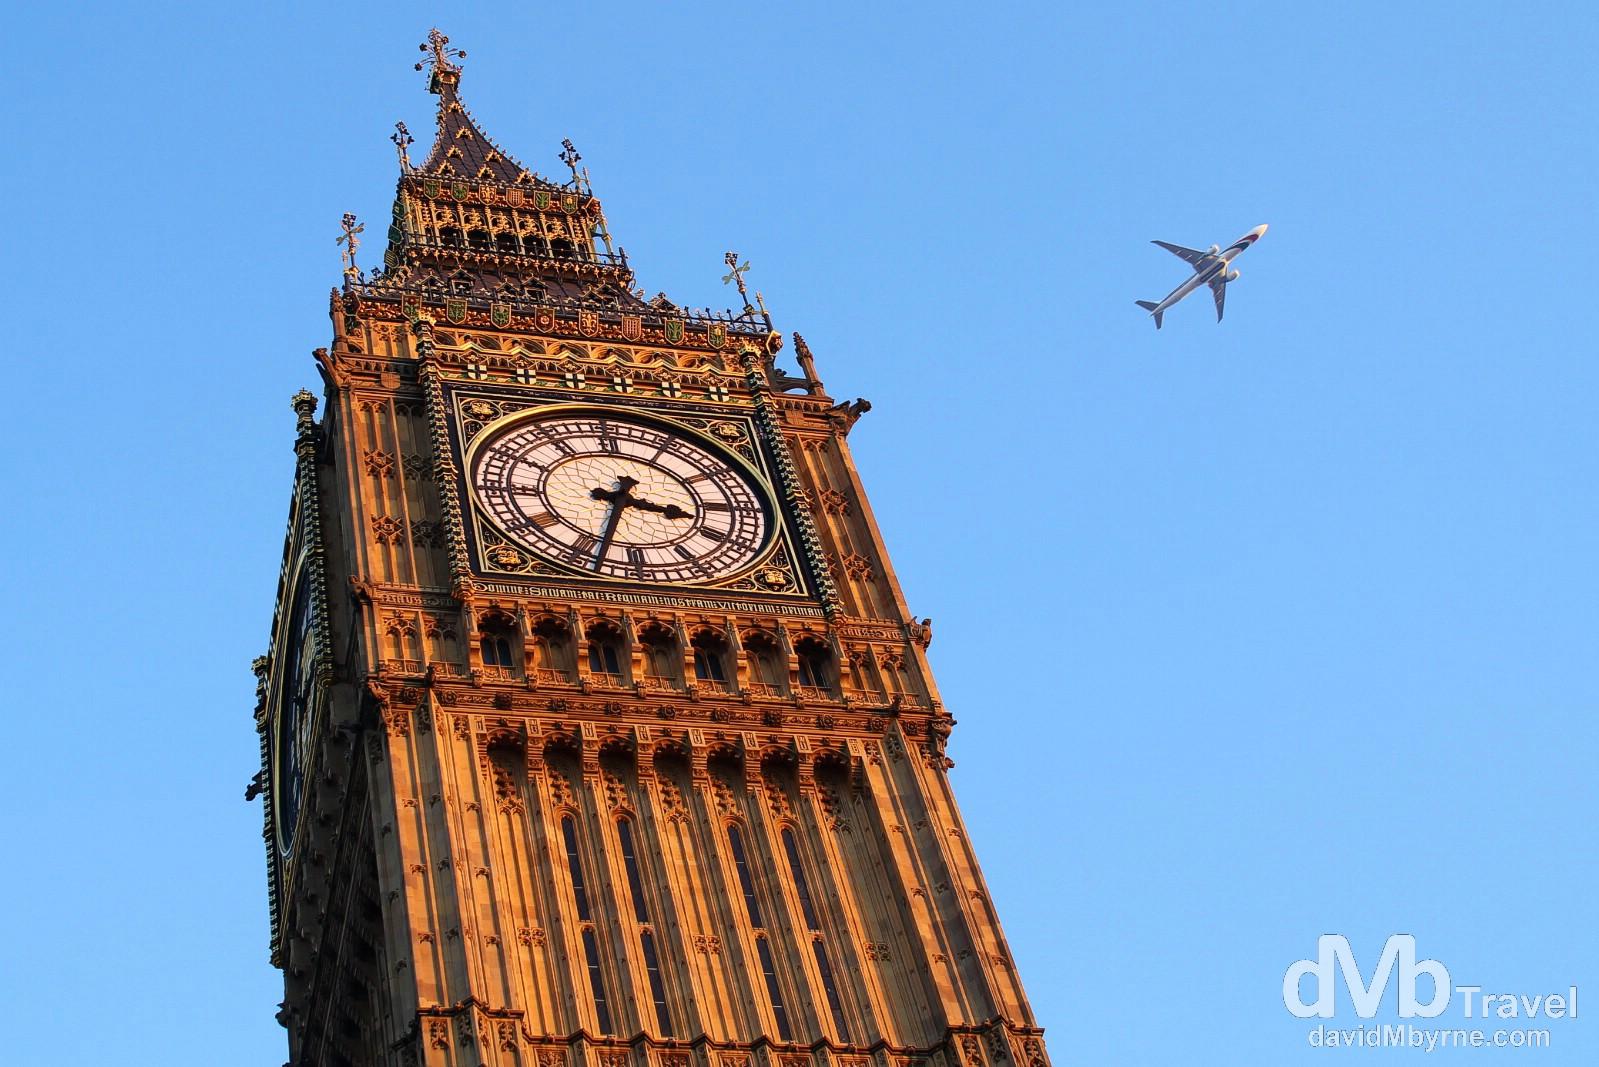 Big Ben, Westminster, London, England. December 8th 2012.